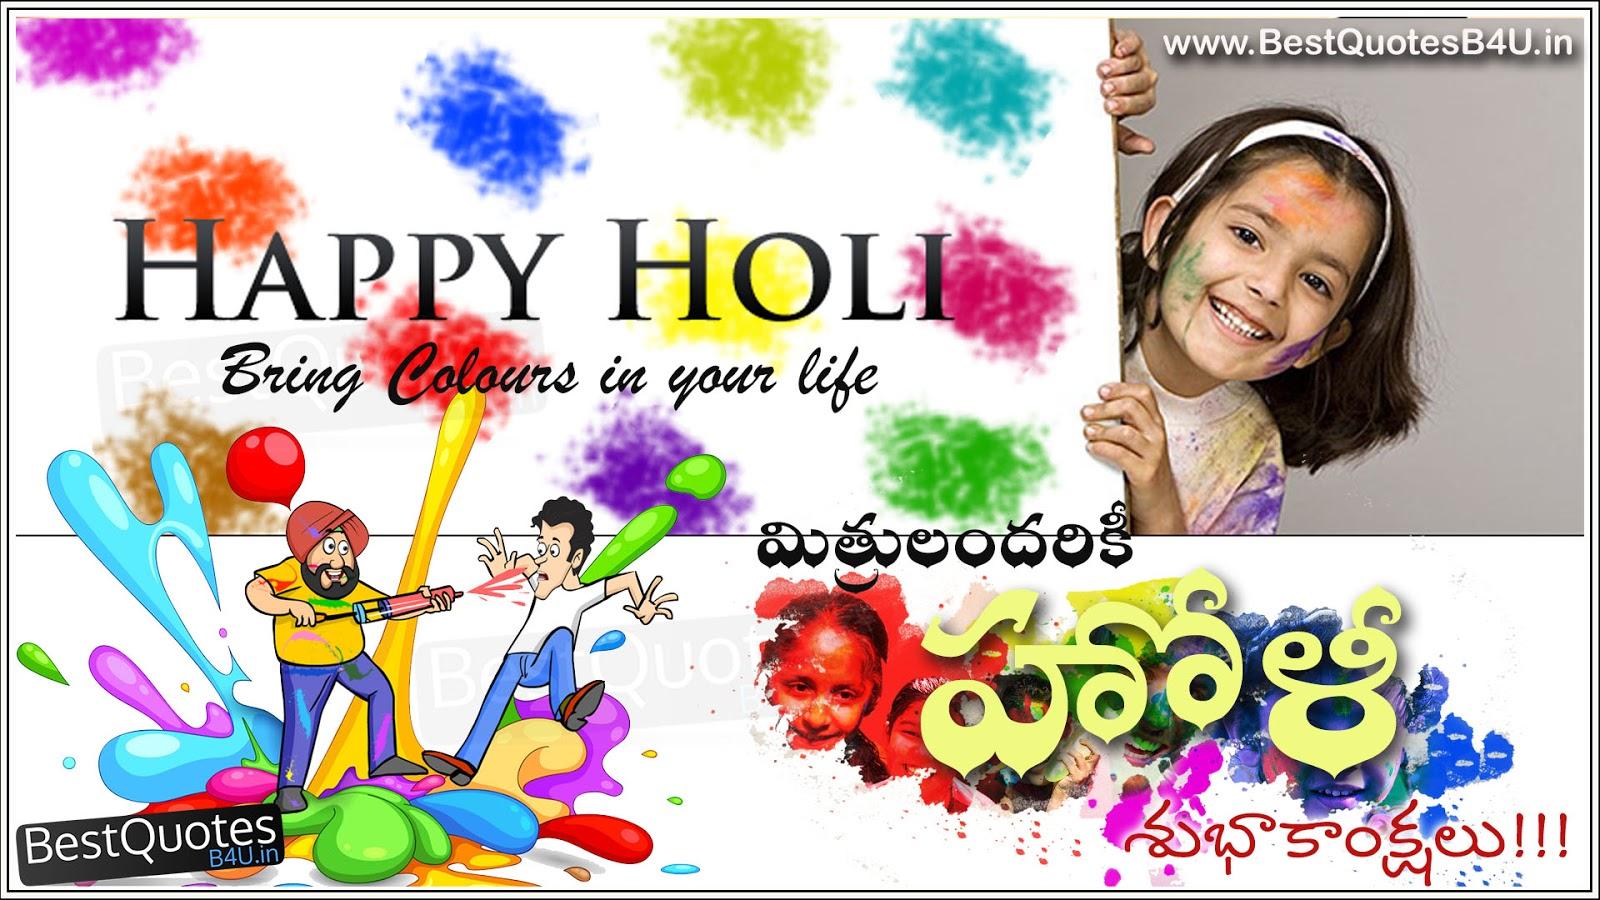 Telugu holi greetings wallpapers quotes bestquotesb4u english telugu holi greetings wallpapers quotes m4hsunfo